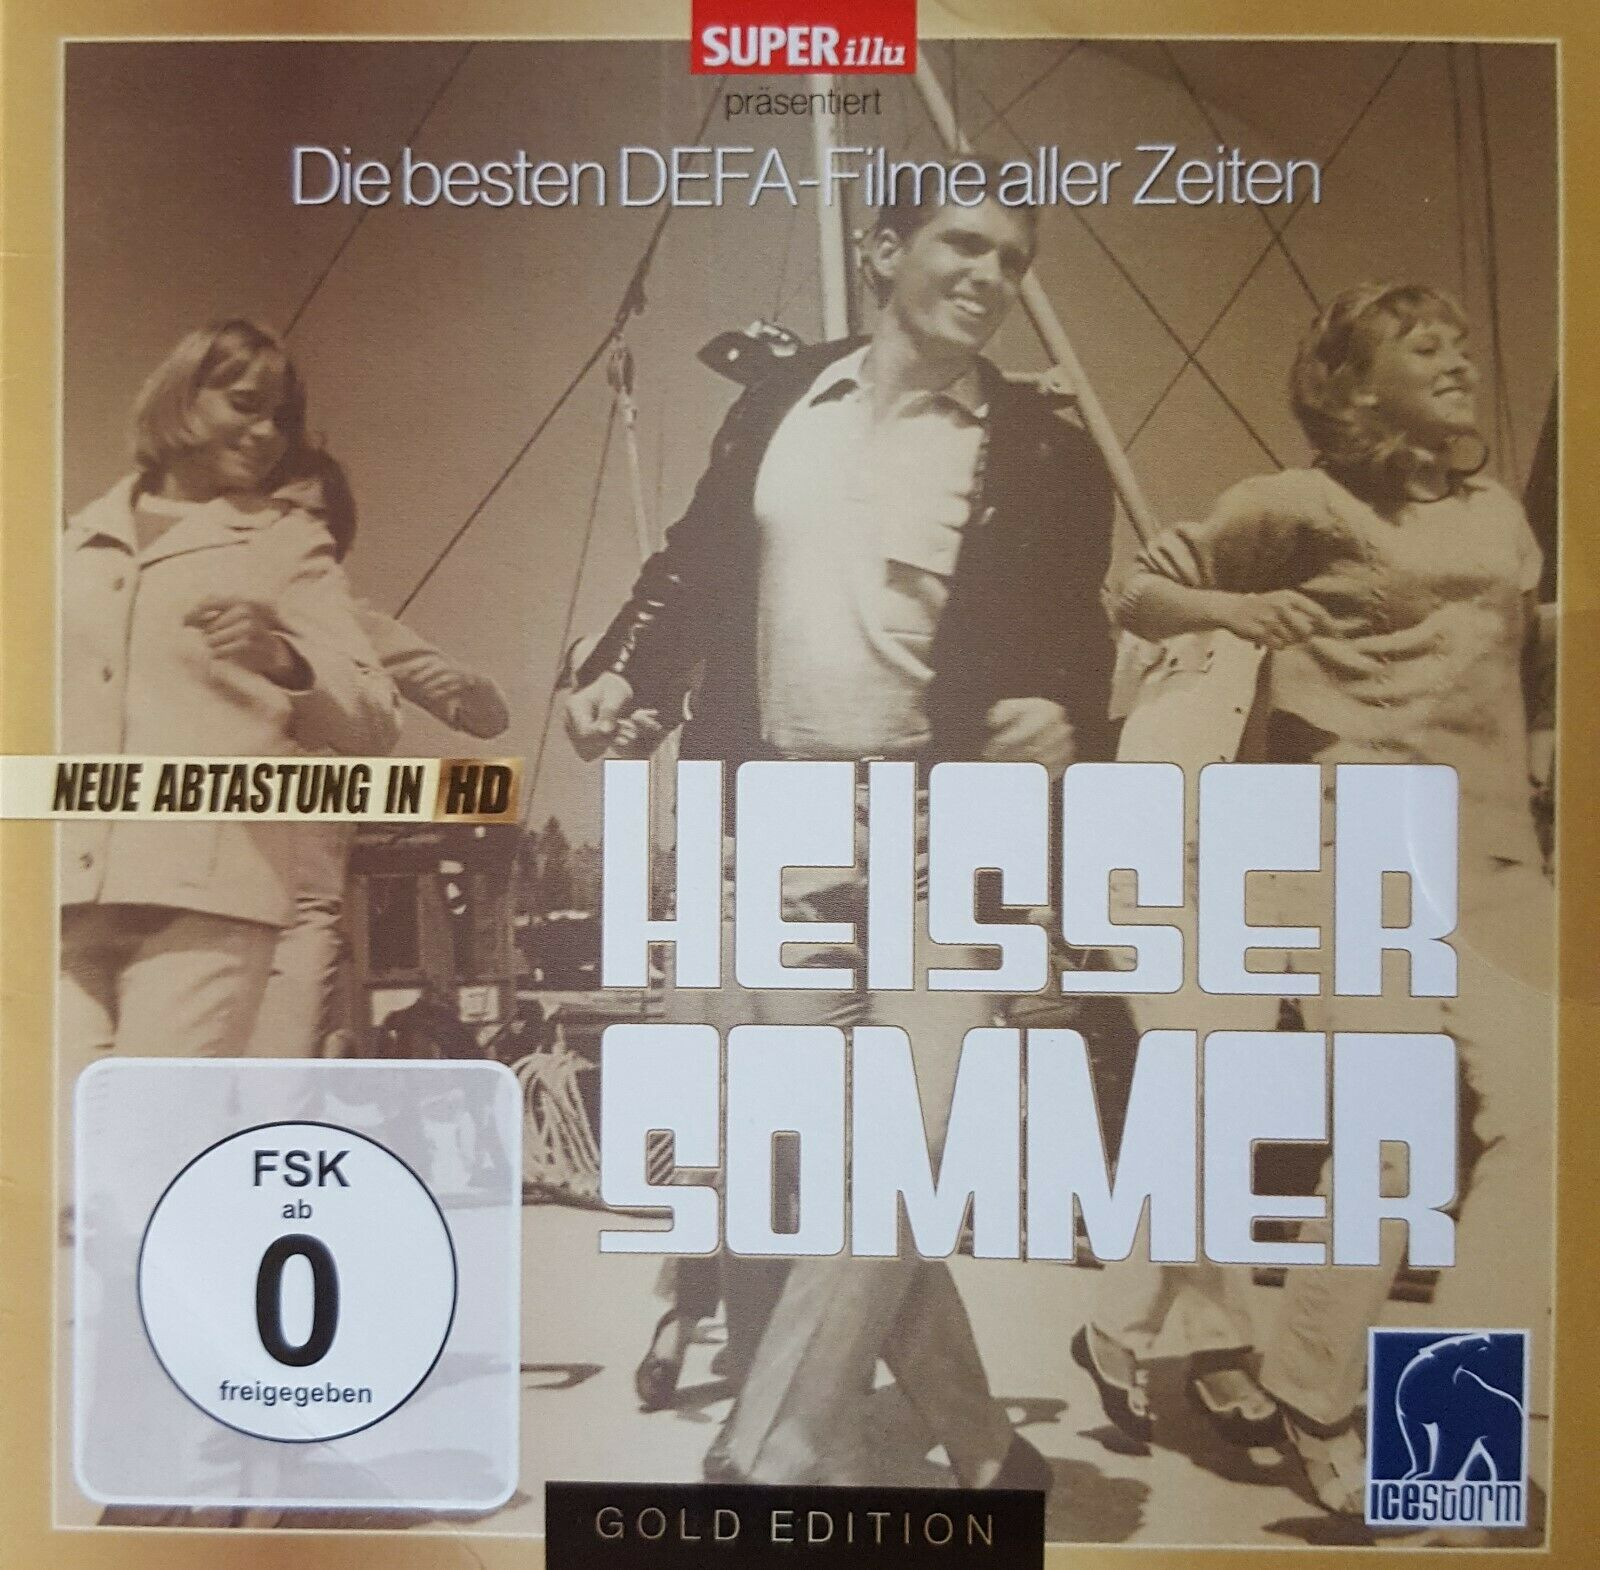 DVD - HEISSER SOMMER - SUPER-illu - DEFA KOMÖDIE - NEUE ABTASTUNG IN HD